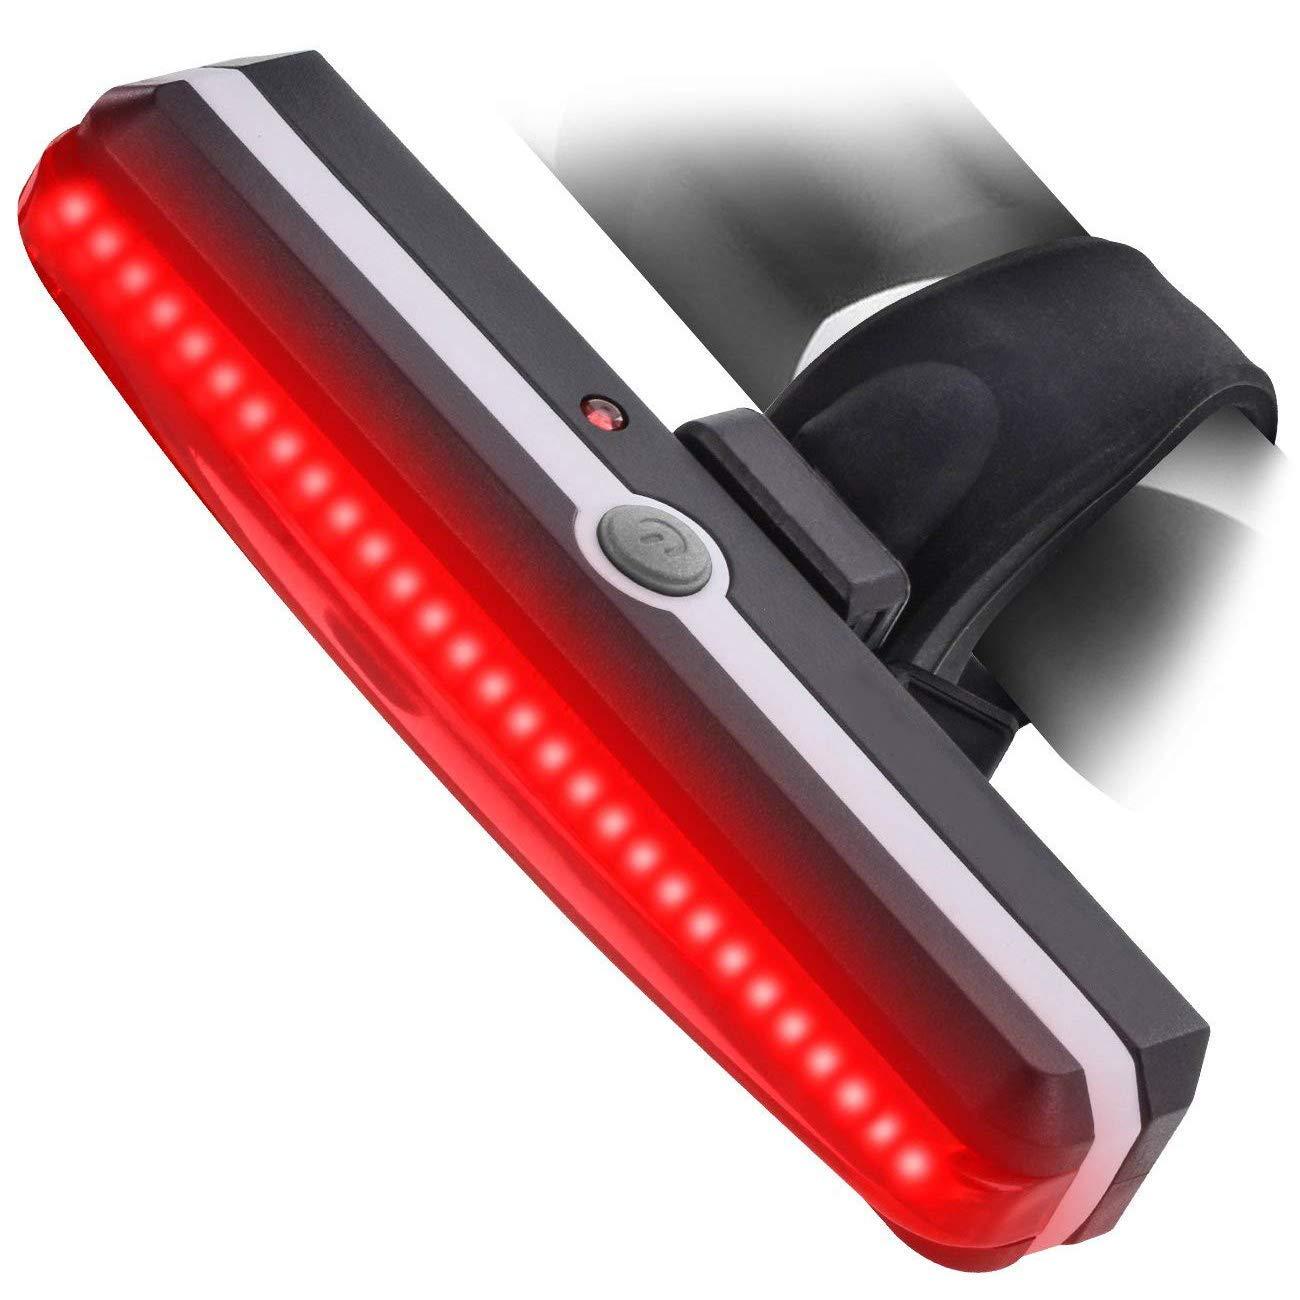 ZOUQILAI Bike Light Super Bright USB Rechargeable Bicycle Tail Light 6 Light Mode Options Rear Bicycle Light Ultra Bright Safety Taillight